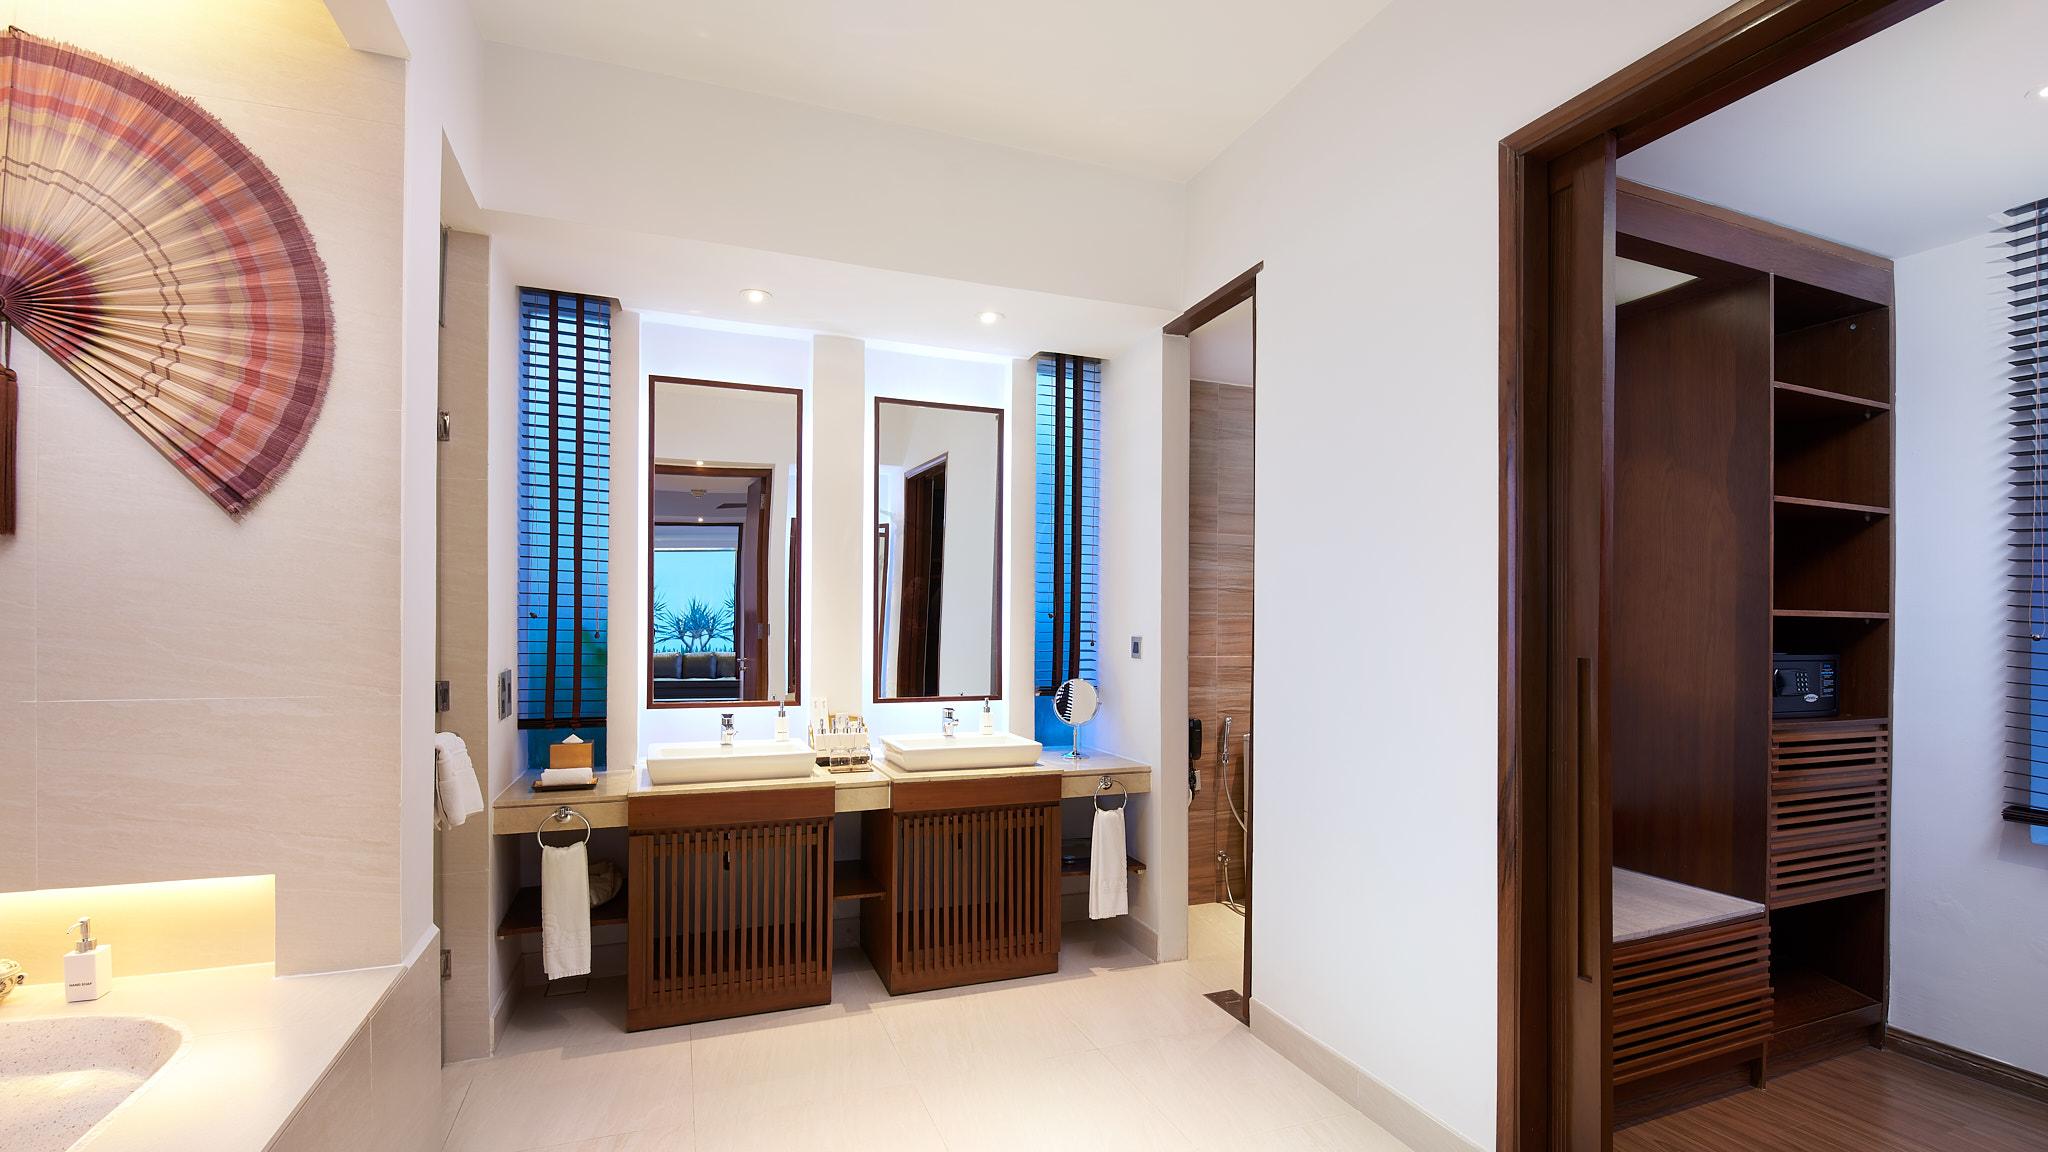 0121_Sunrise Hoi An_Pool Villa Bathroom.jpg